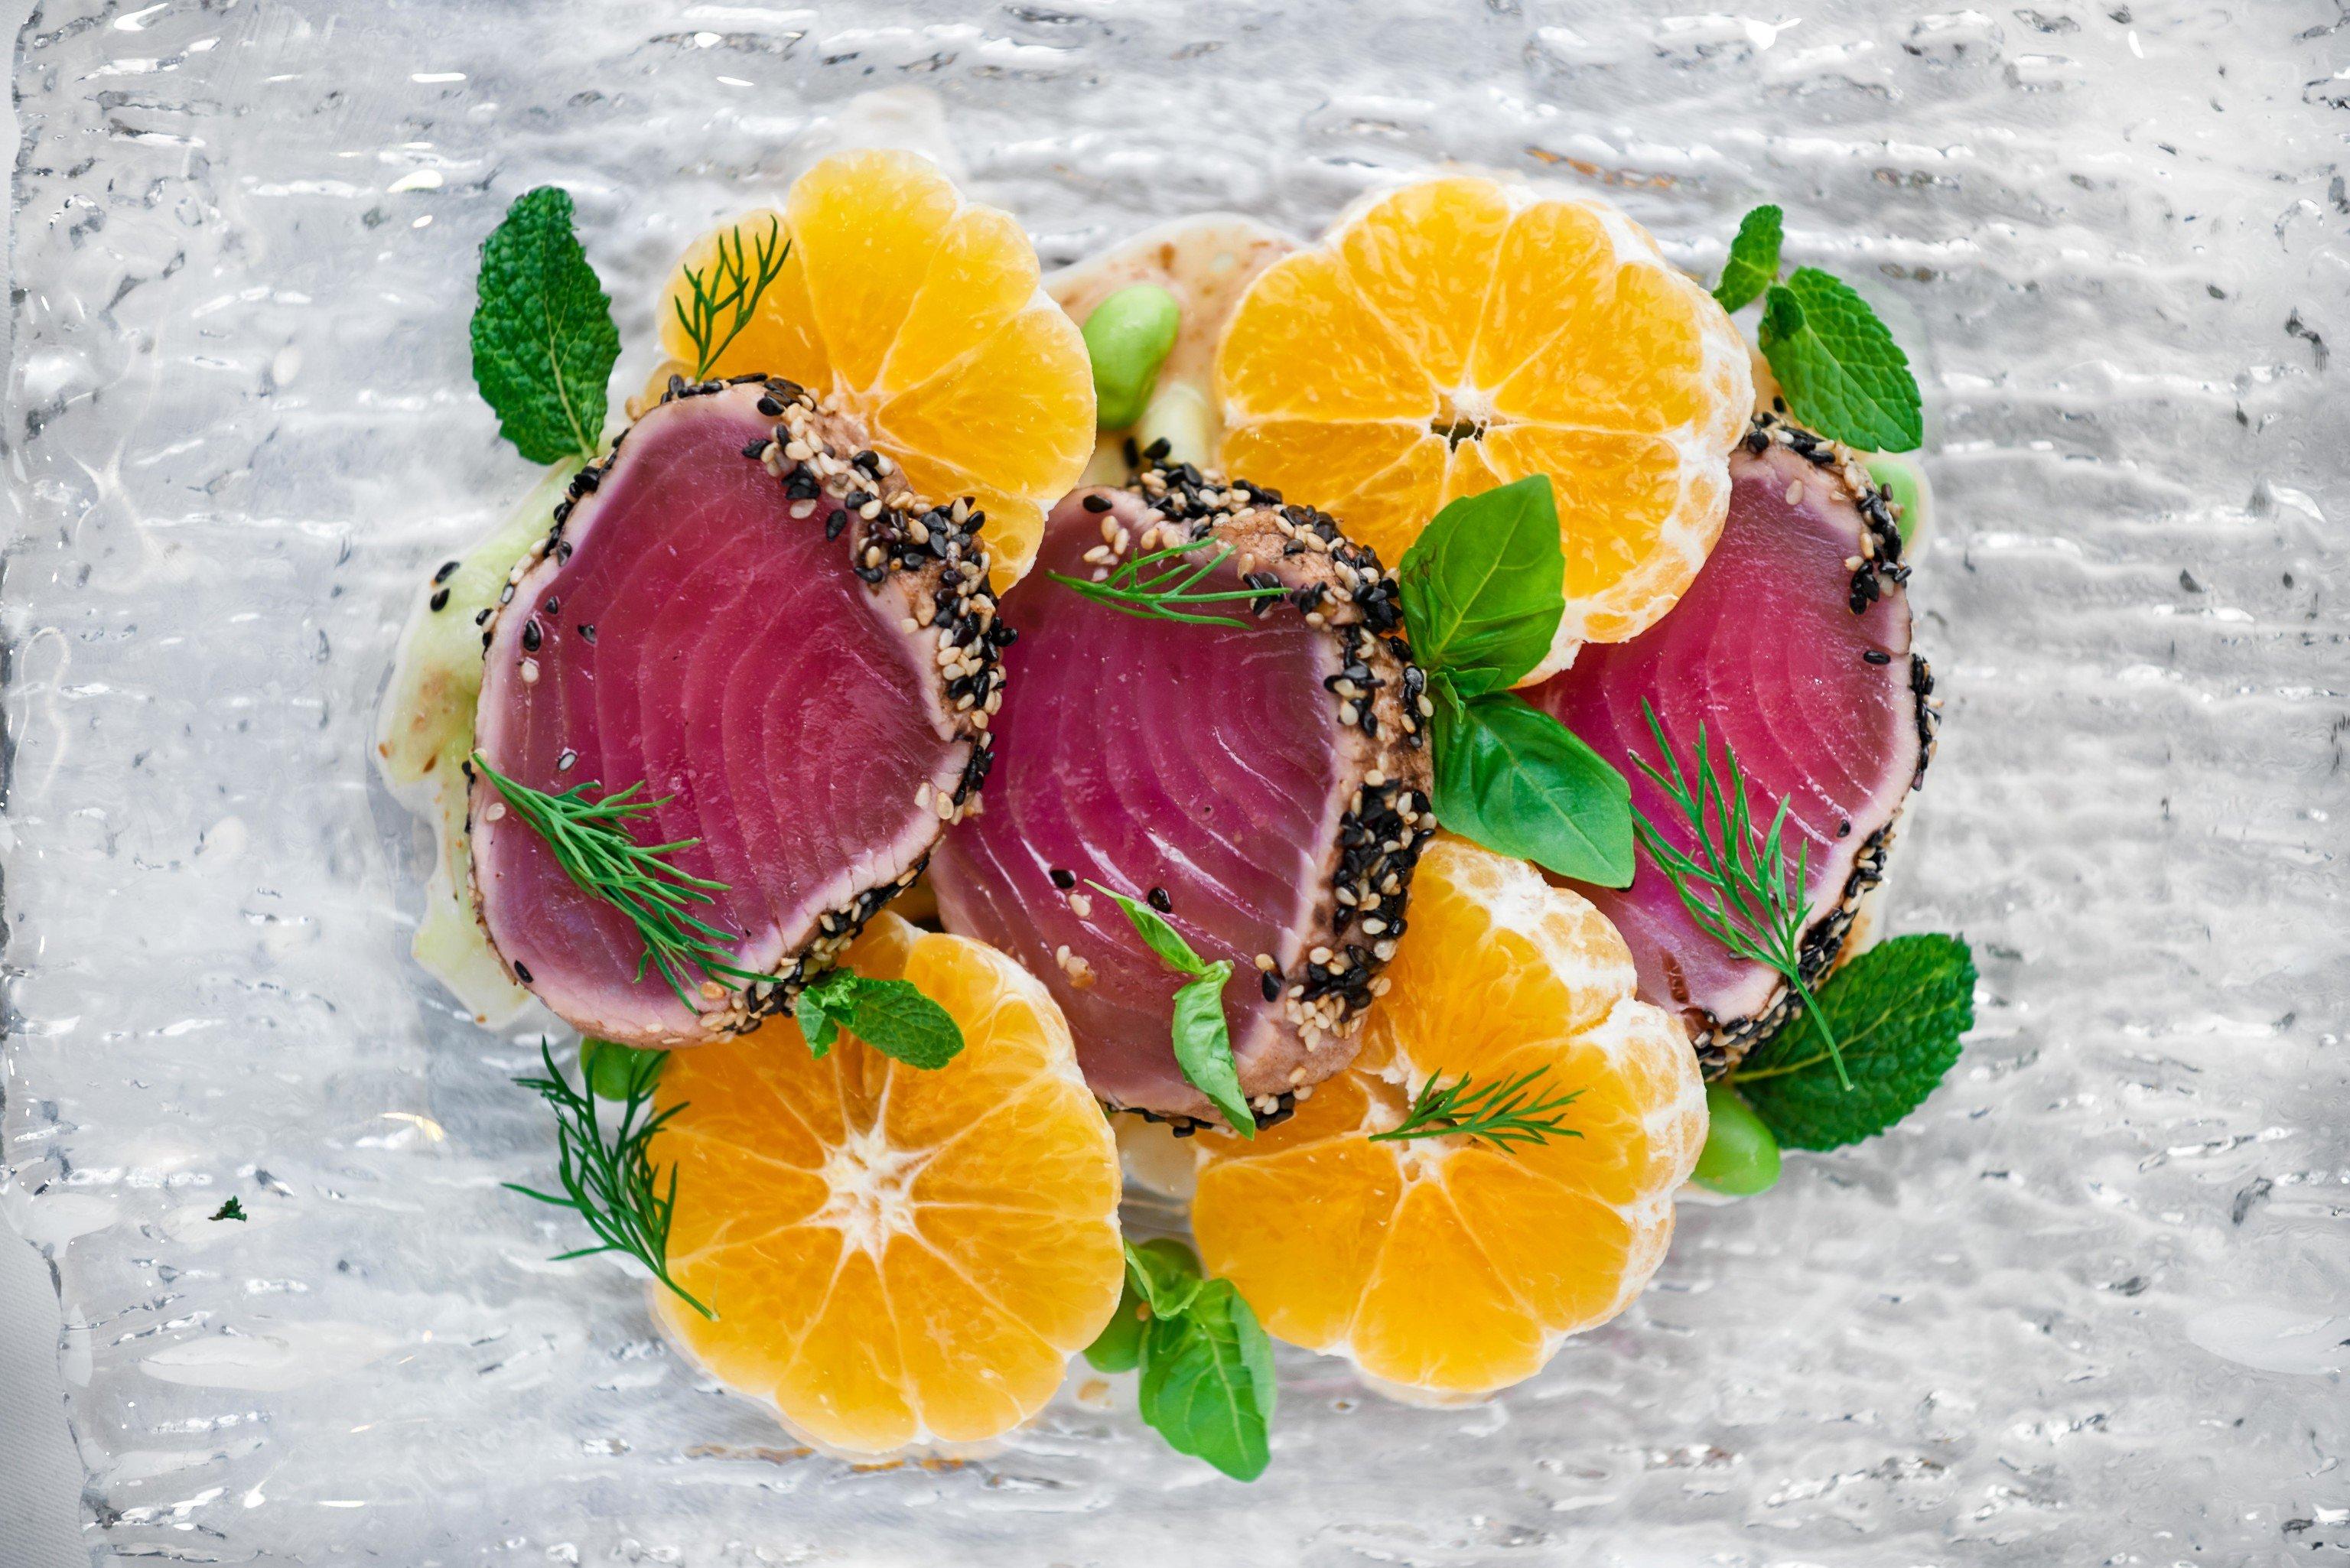 Food + Drink London food fruit produce plant vegetarian food garnish vegetable flower colored colorful arranged fresh